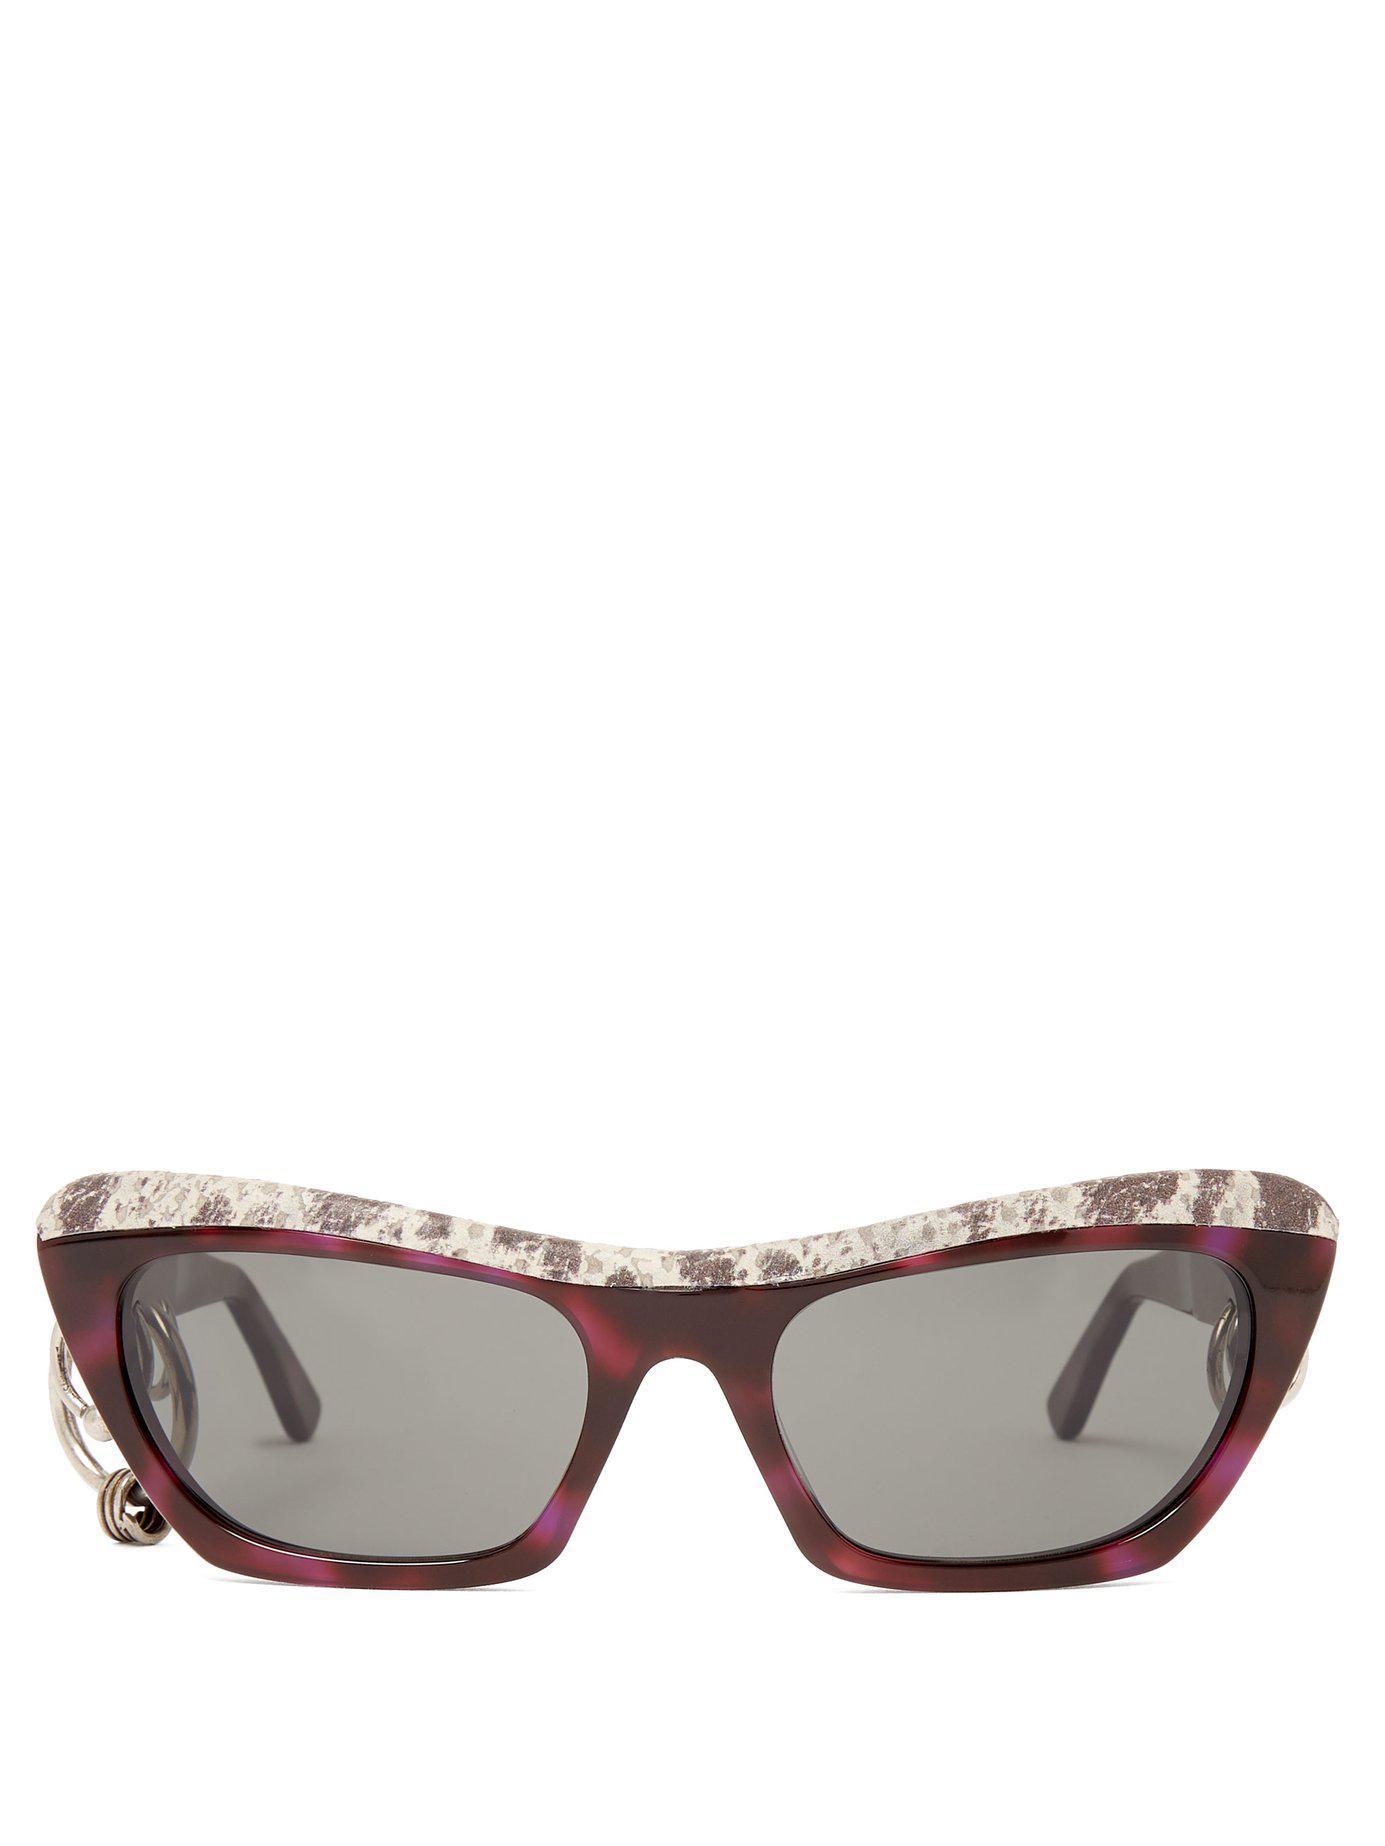 831e08f63d Acne Studios. Women s Dielle Cat Eye Leather And Acetate Sunglasses